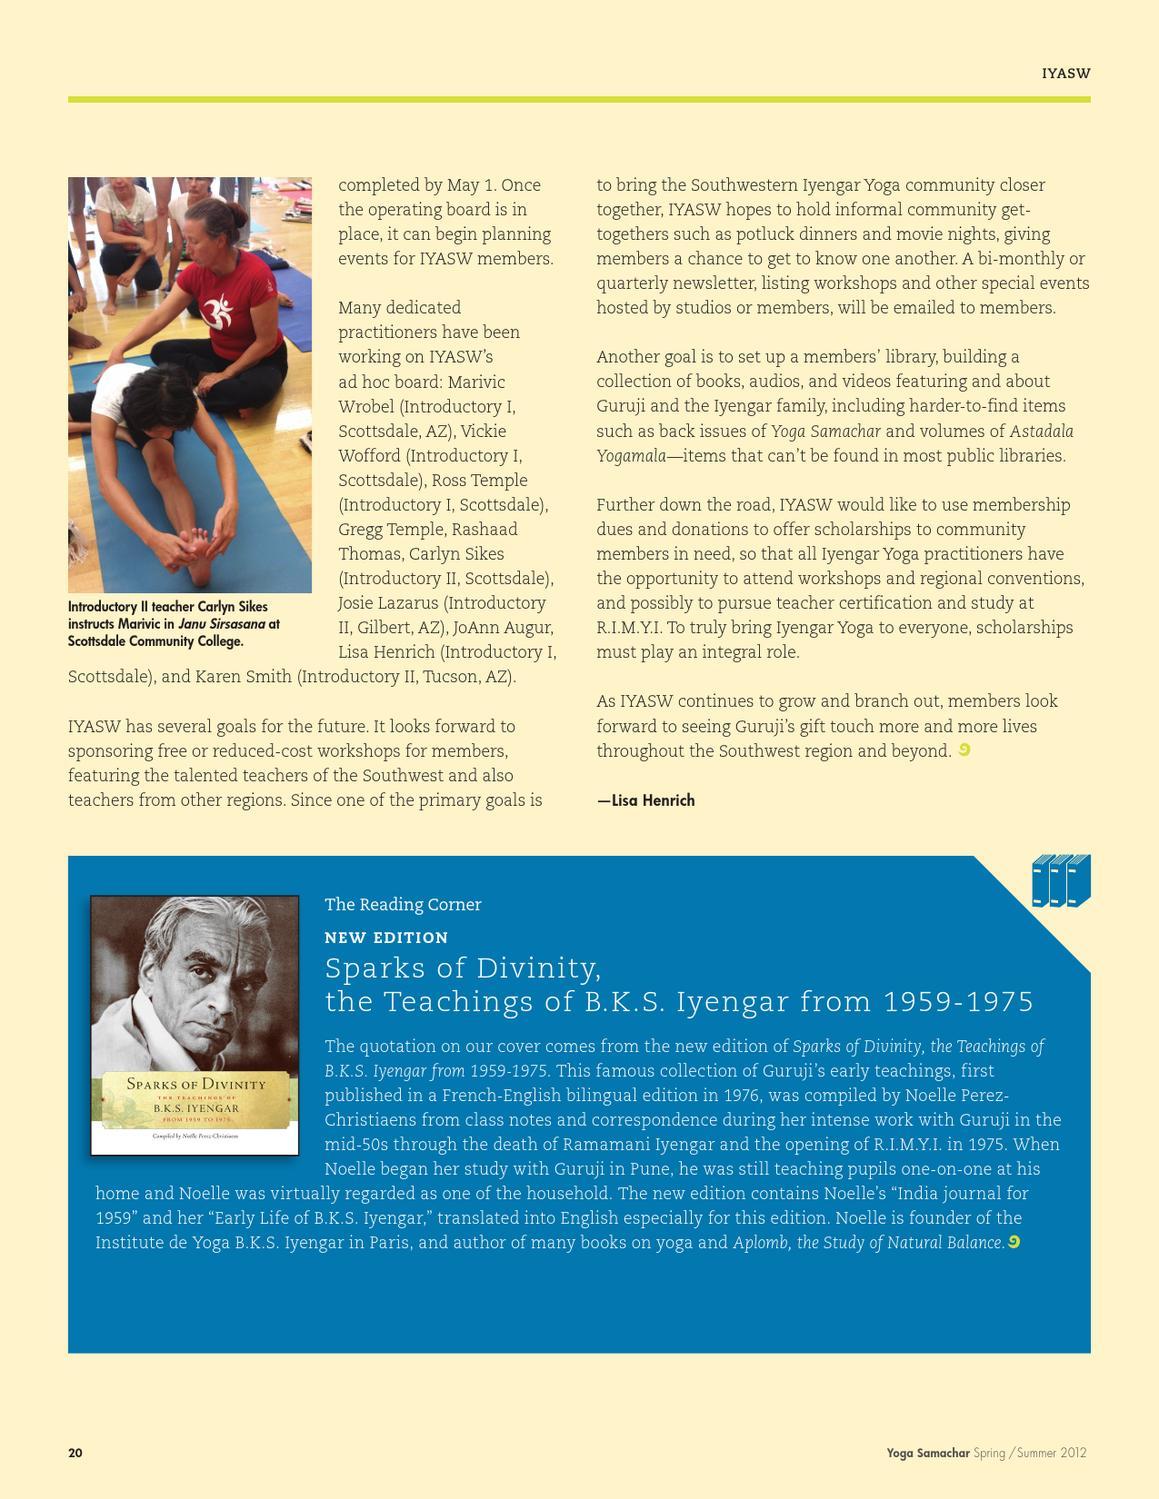 Yoga Samachar Springsummer 2012 By Don Gura Graphic Design Inc